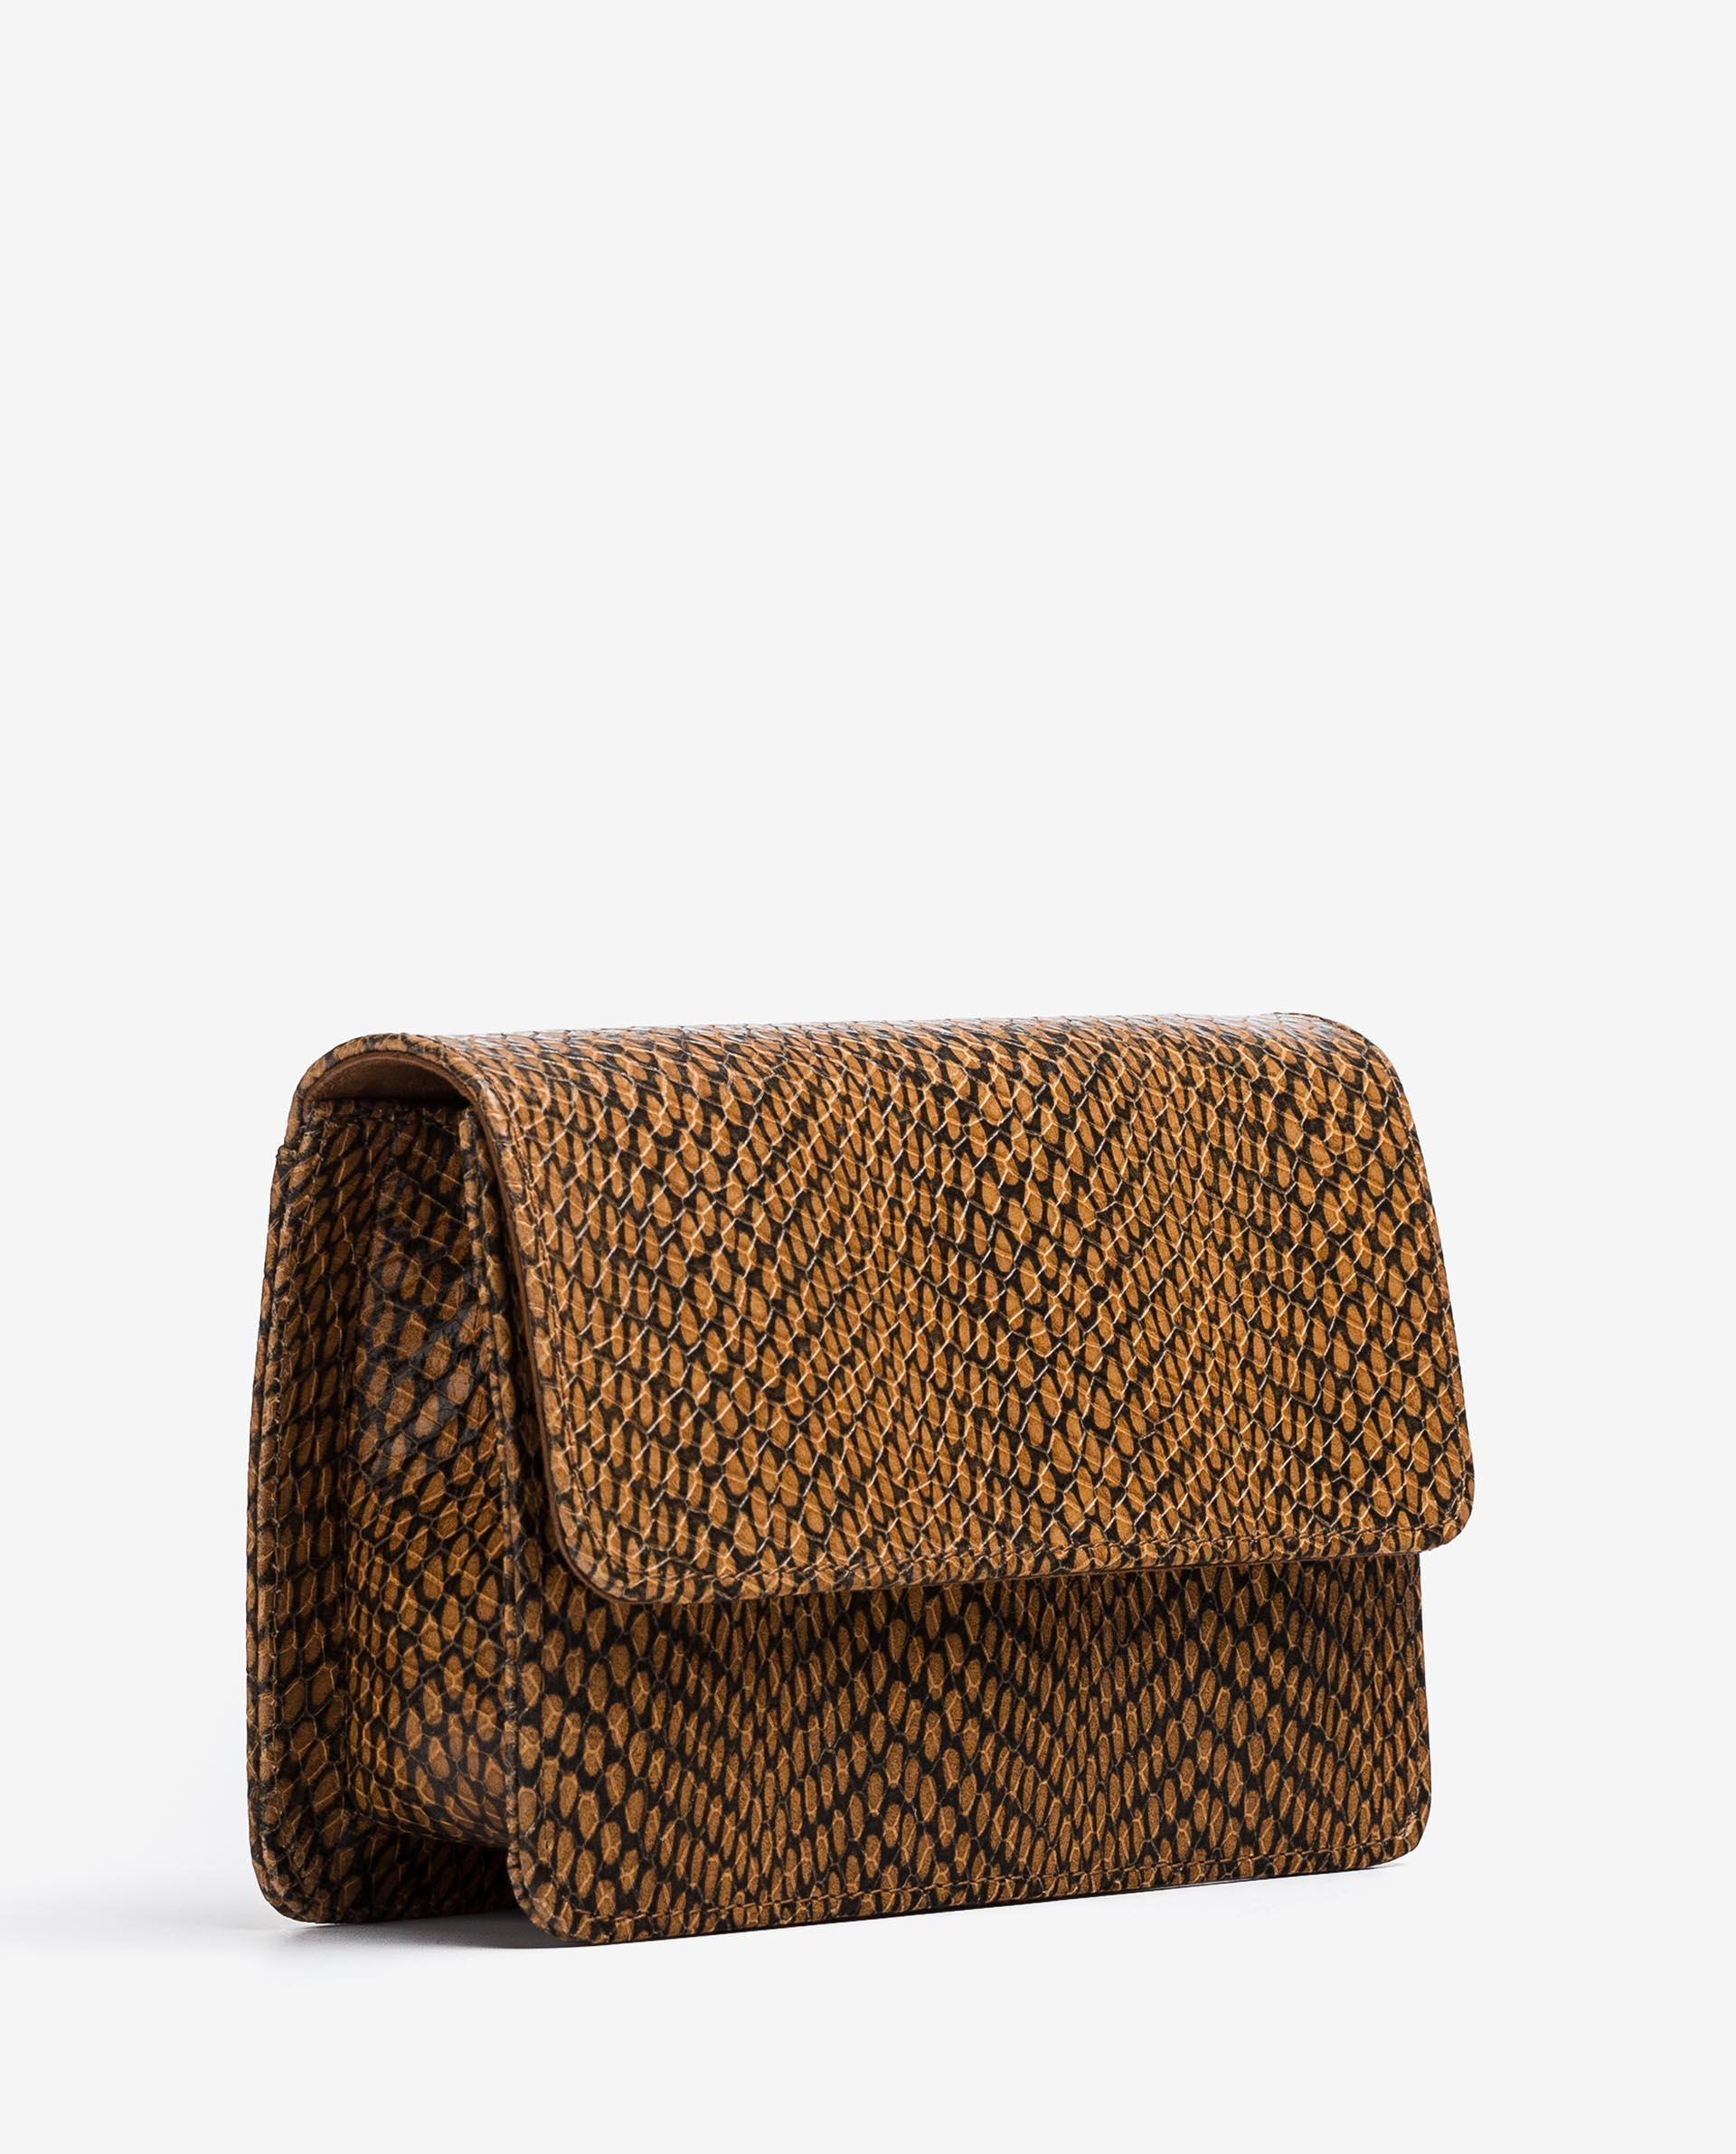 UNISA Snake effect leather handbag ZBELA_MA 2